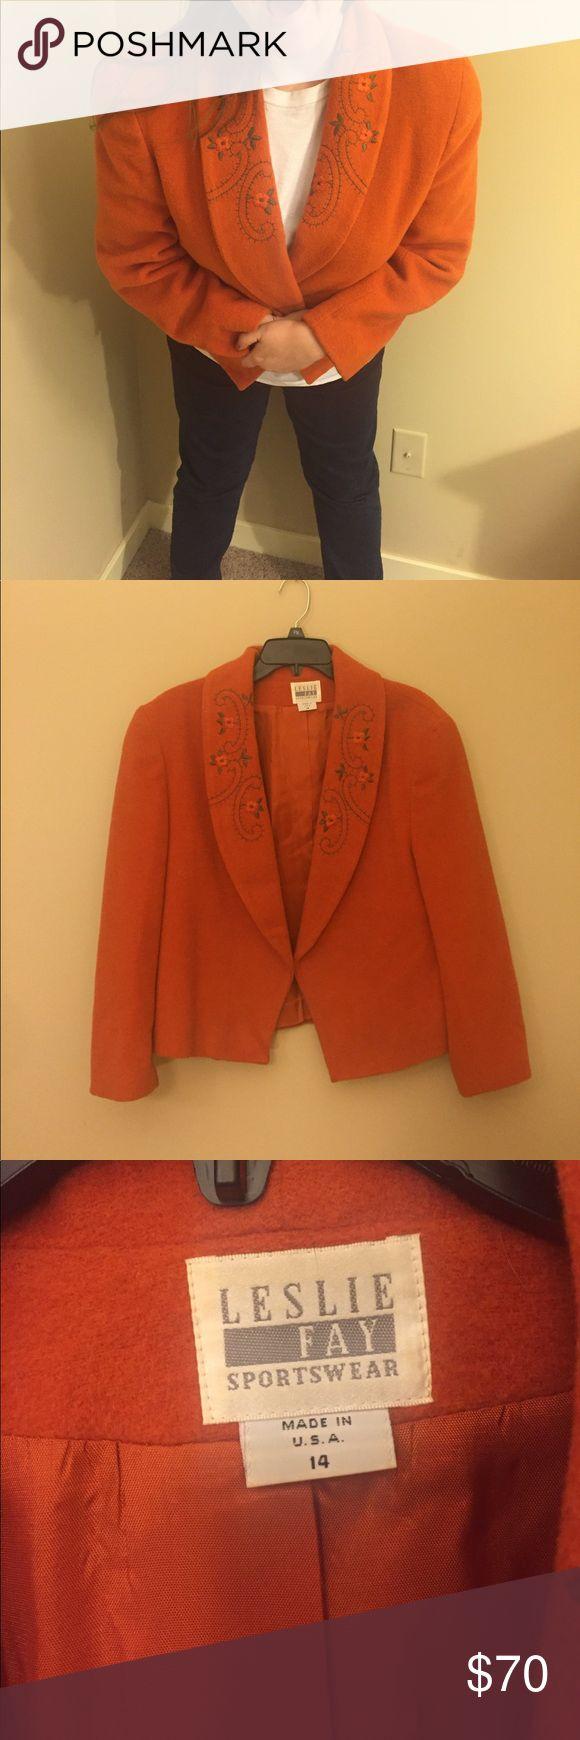 Vintage Leslie Fay sportswear coat Size 14 Leslie Fay Jackets & Coats